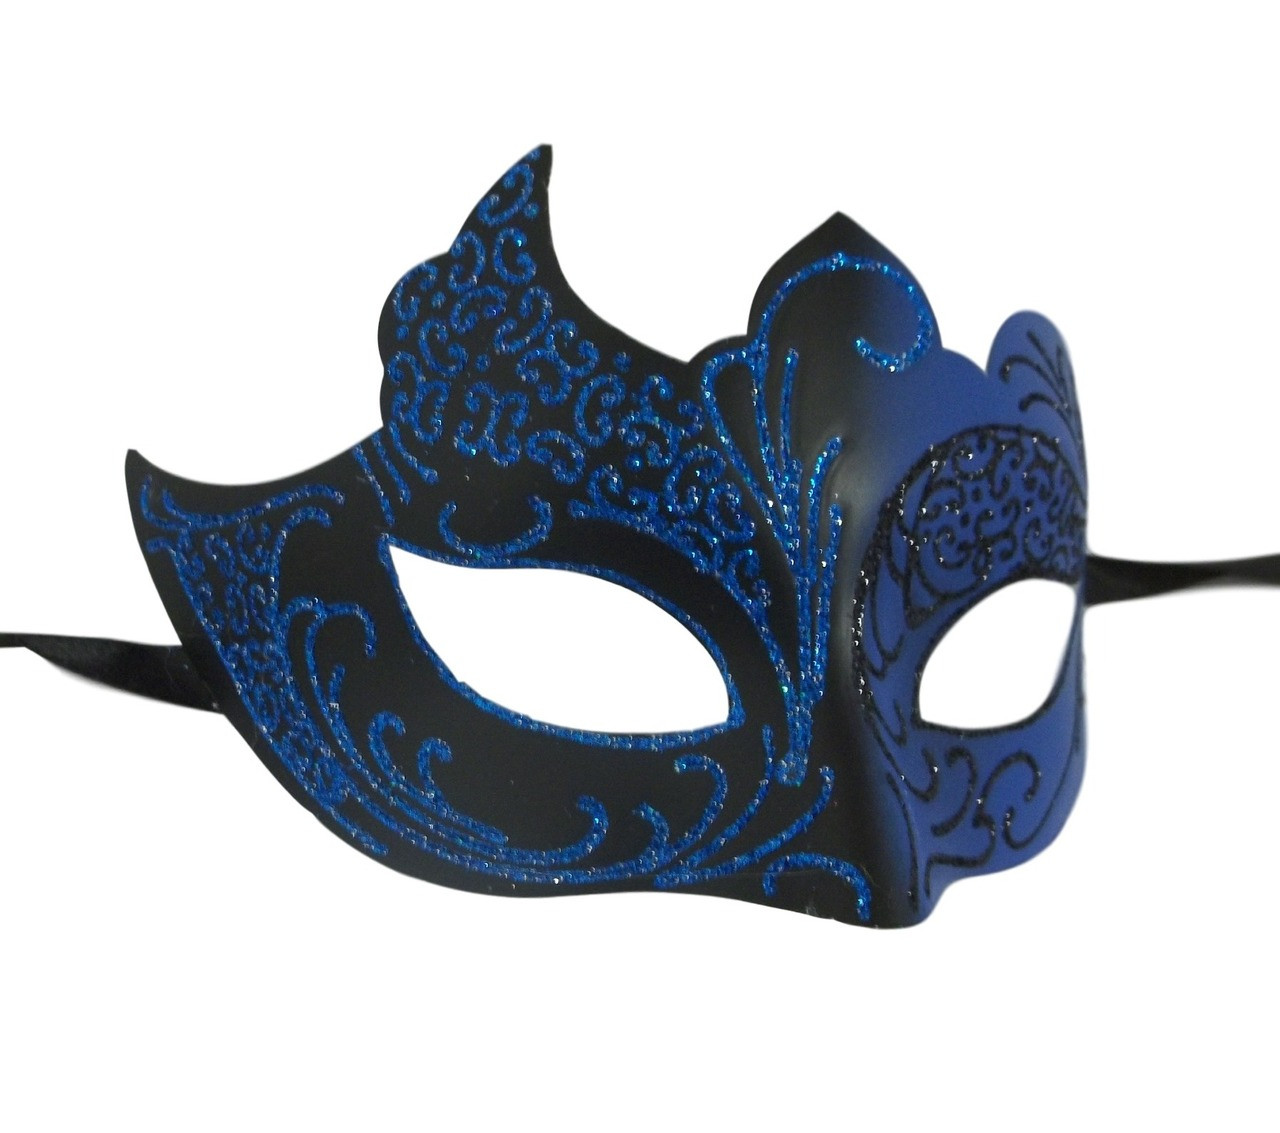 U306 Ambrosia Dark Blue Masquerade Mask